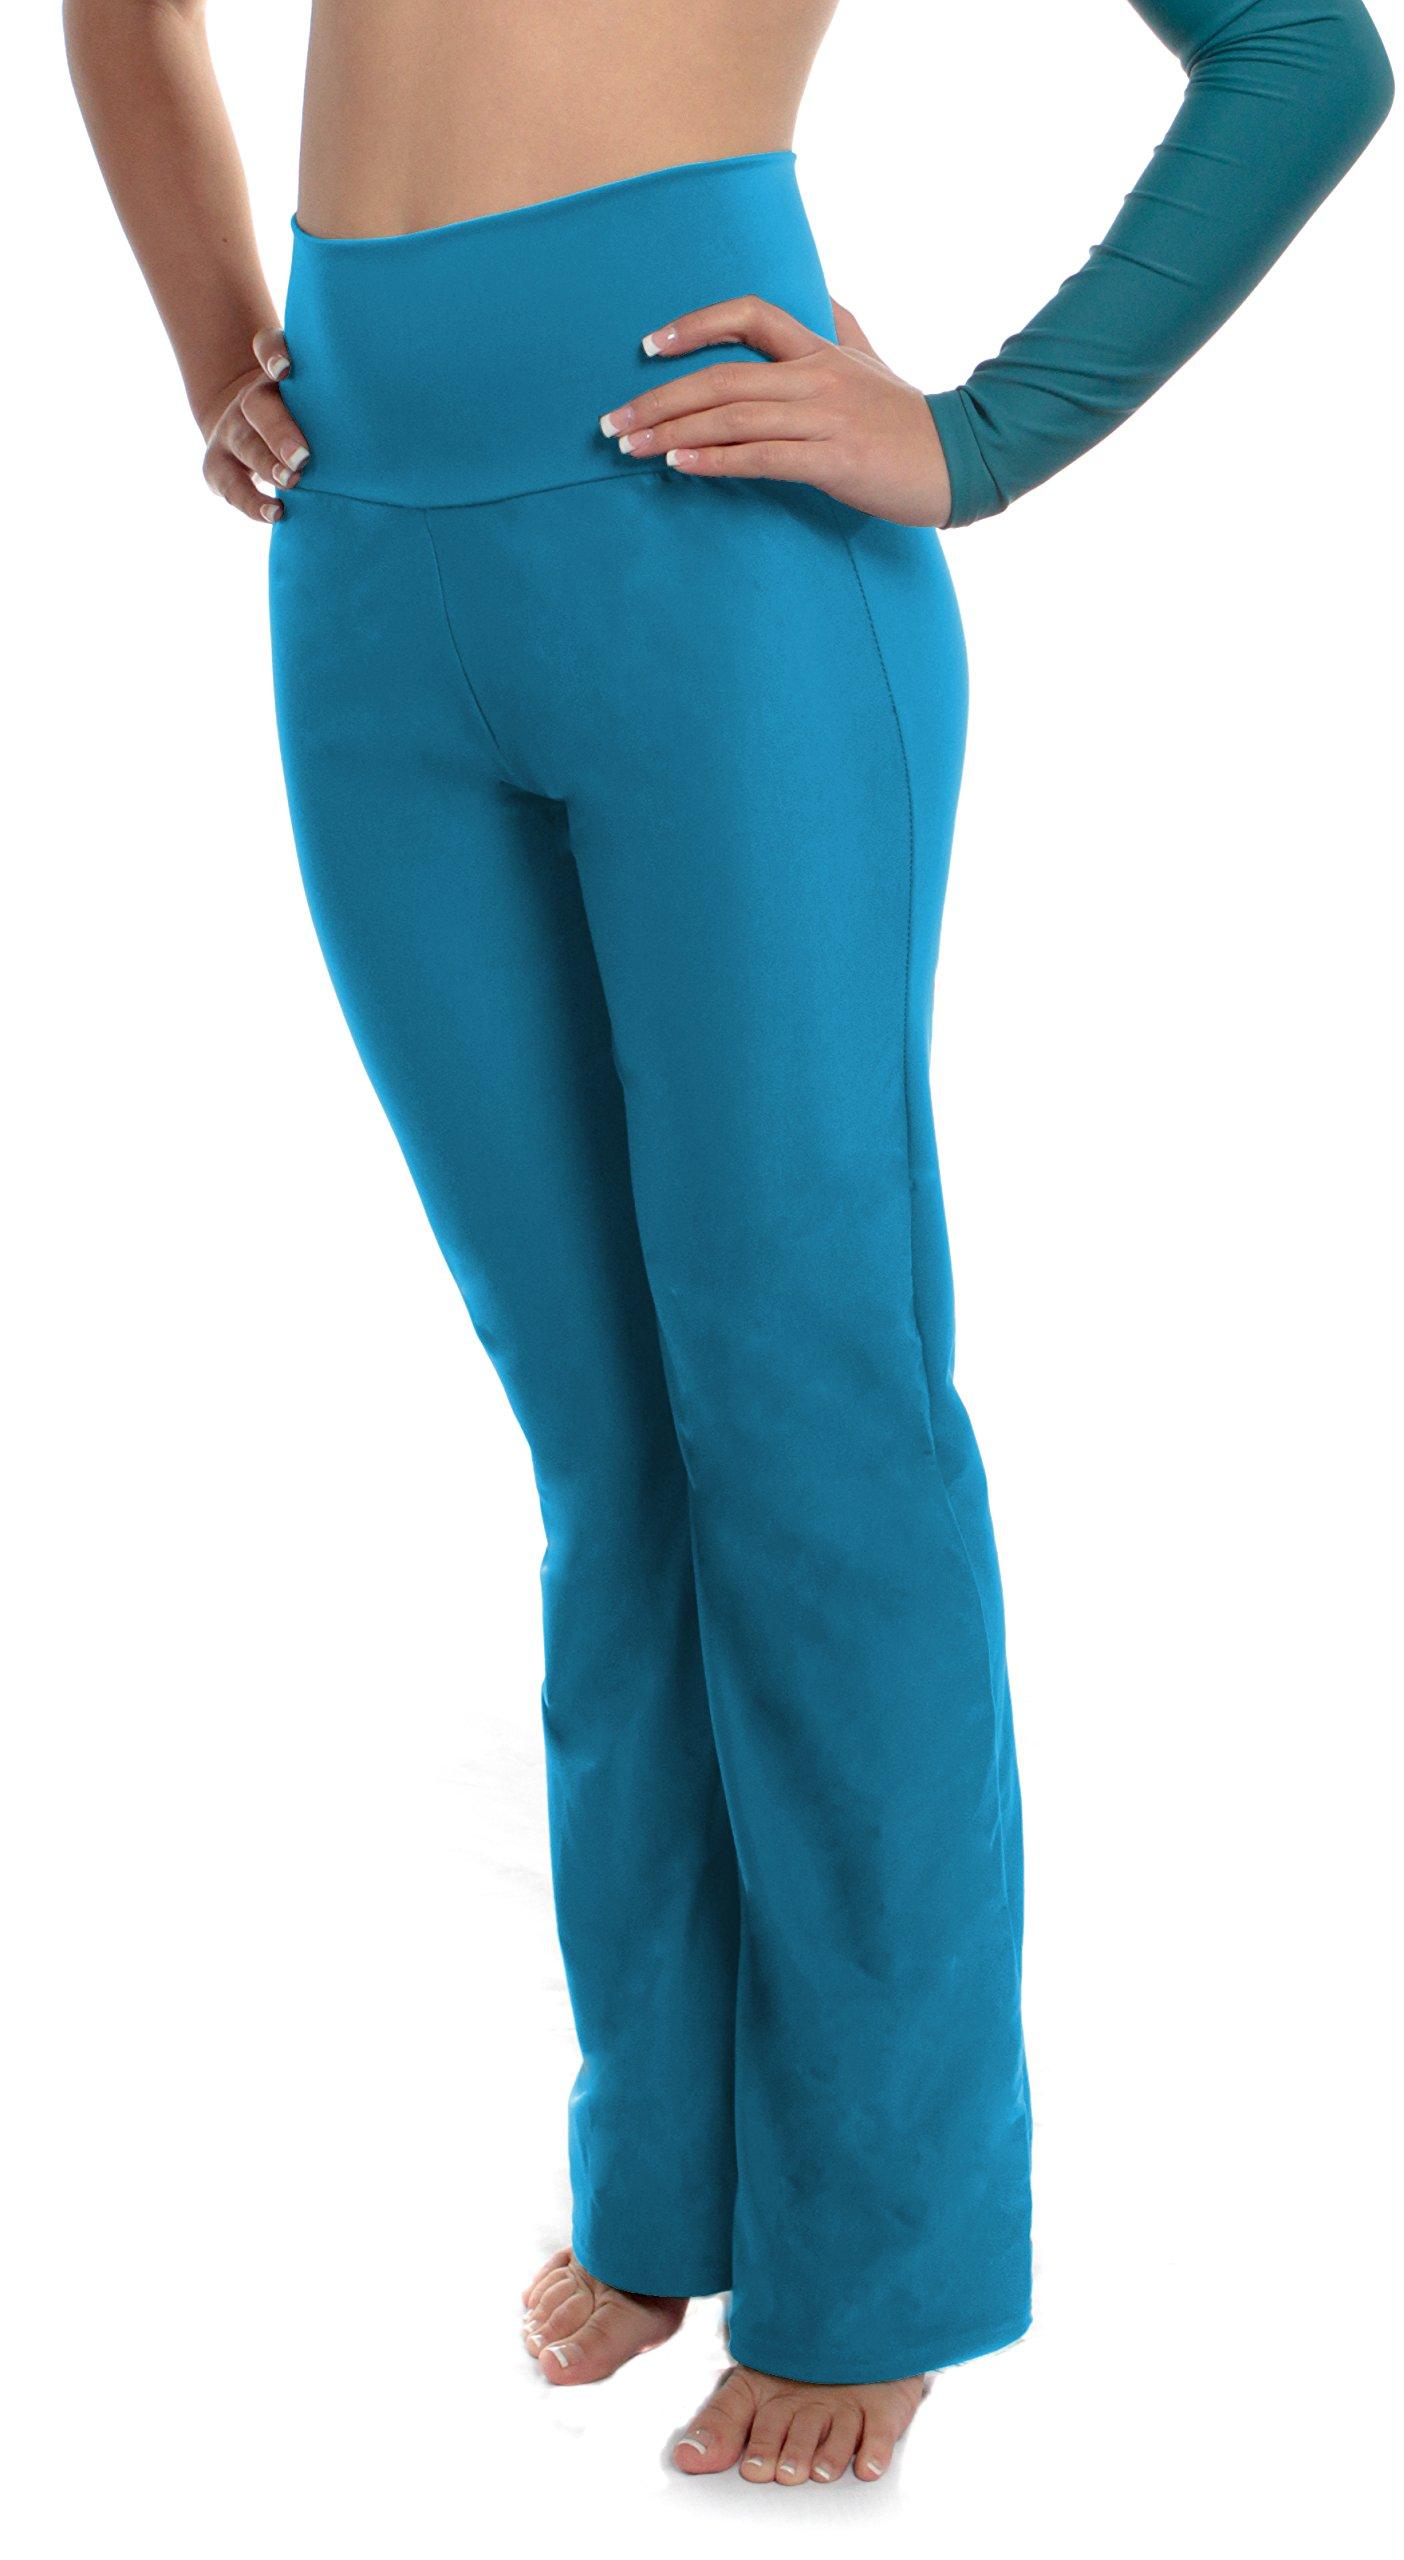 B Dancewear Girls High Waist Dance Pants Small Turquoise by Child and Kid Sizes by B Dancewear